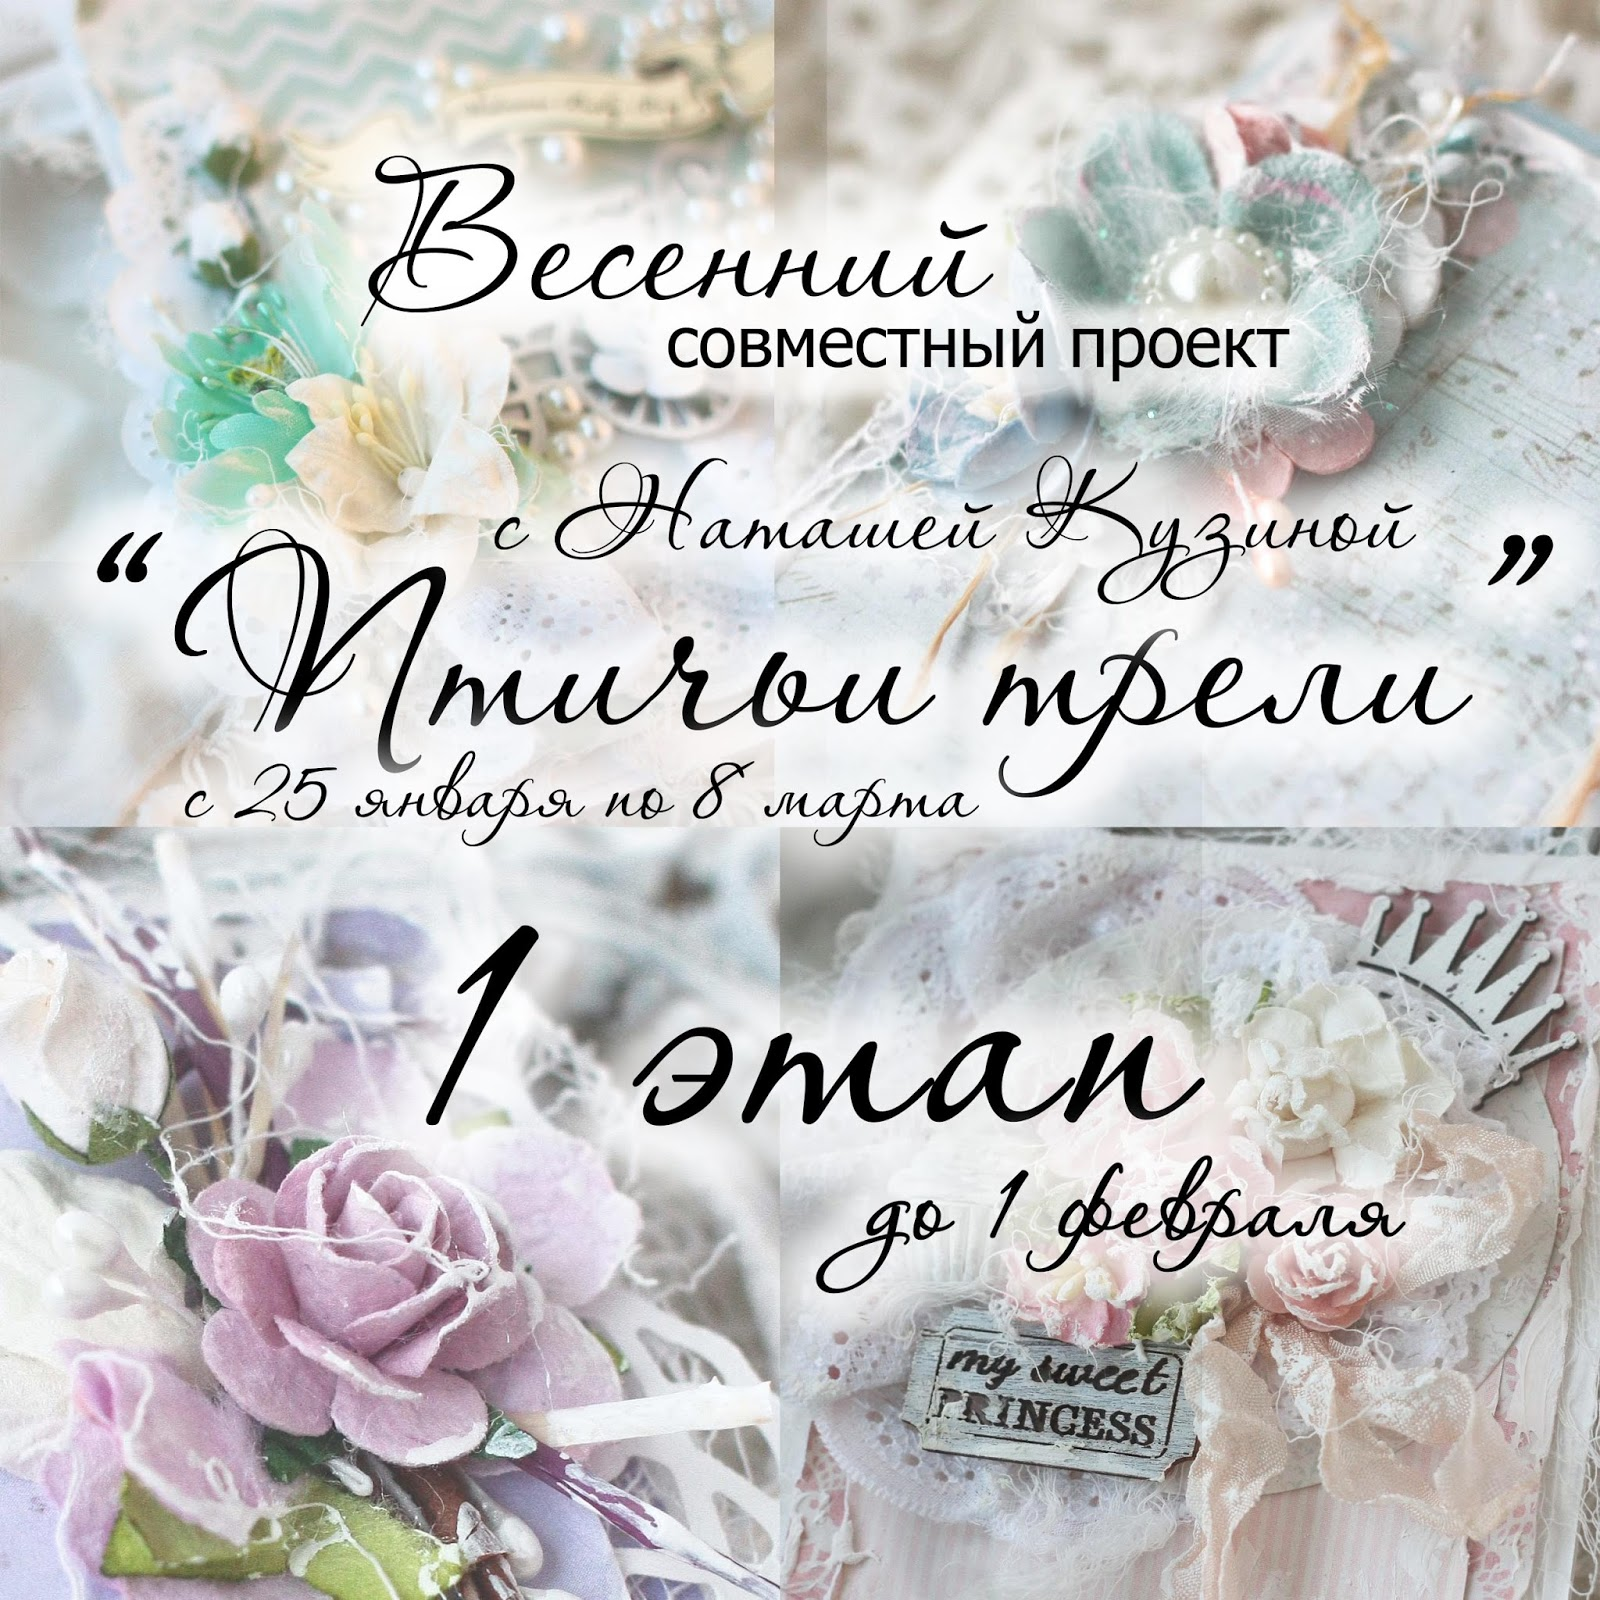 http://ruchnye-podarki.blogspot.ru/2015/01/1-8.html?showComment=1422276443341#c1781854585812828389